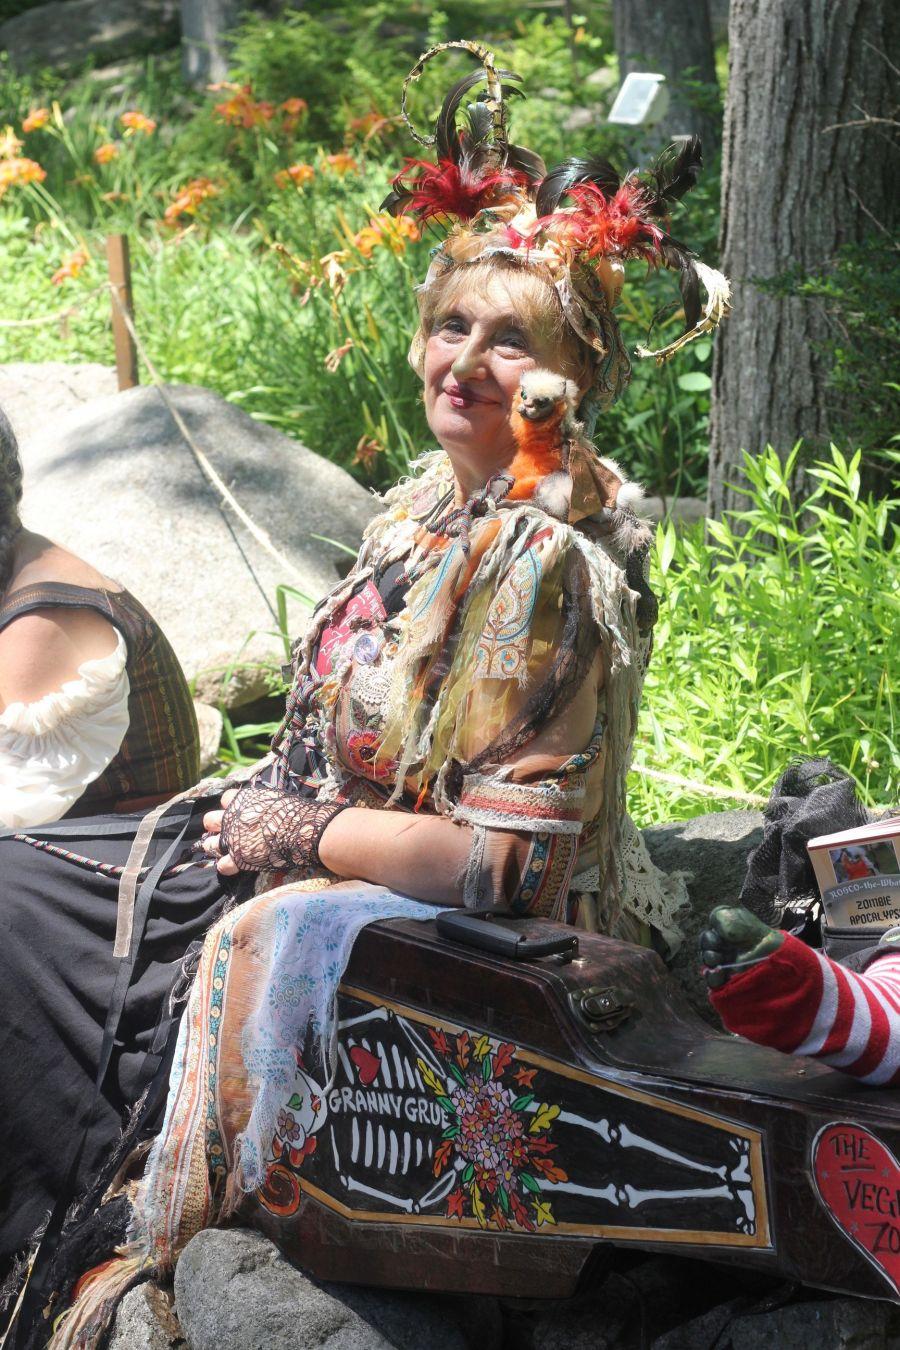 gloucester hammond castle renaissance fair woman in feather outfit